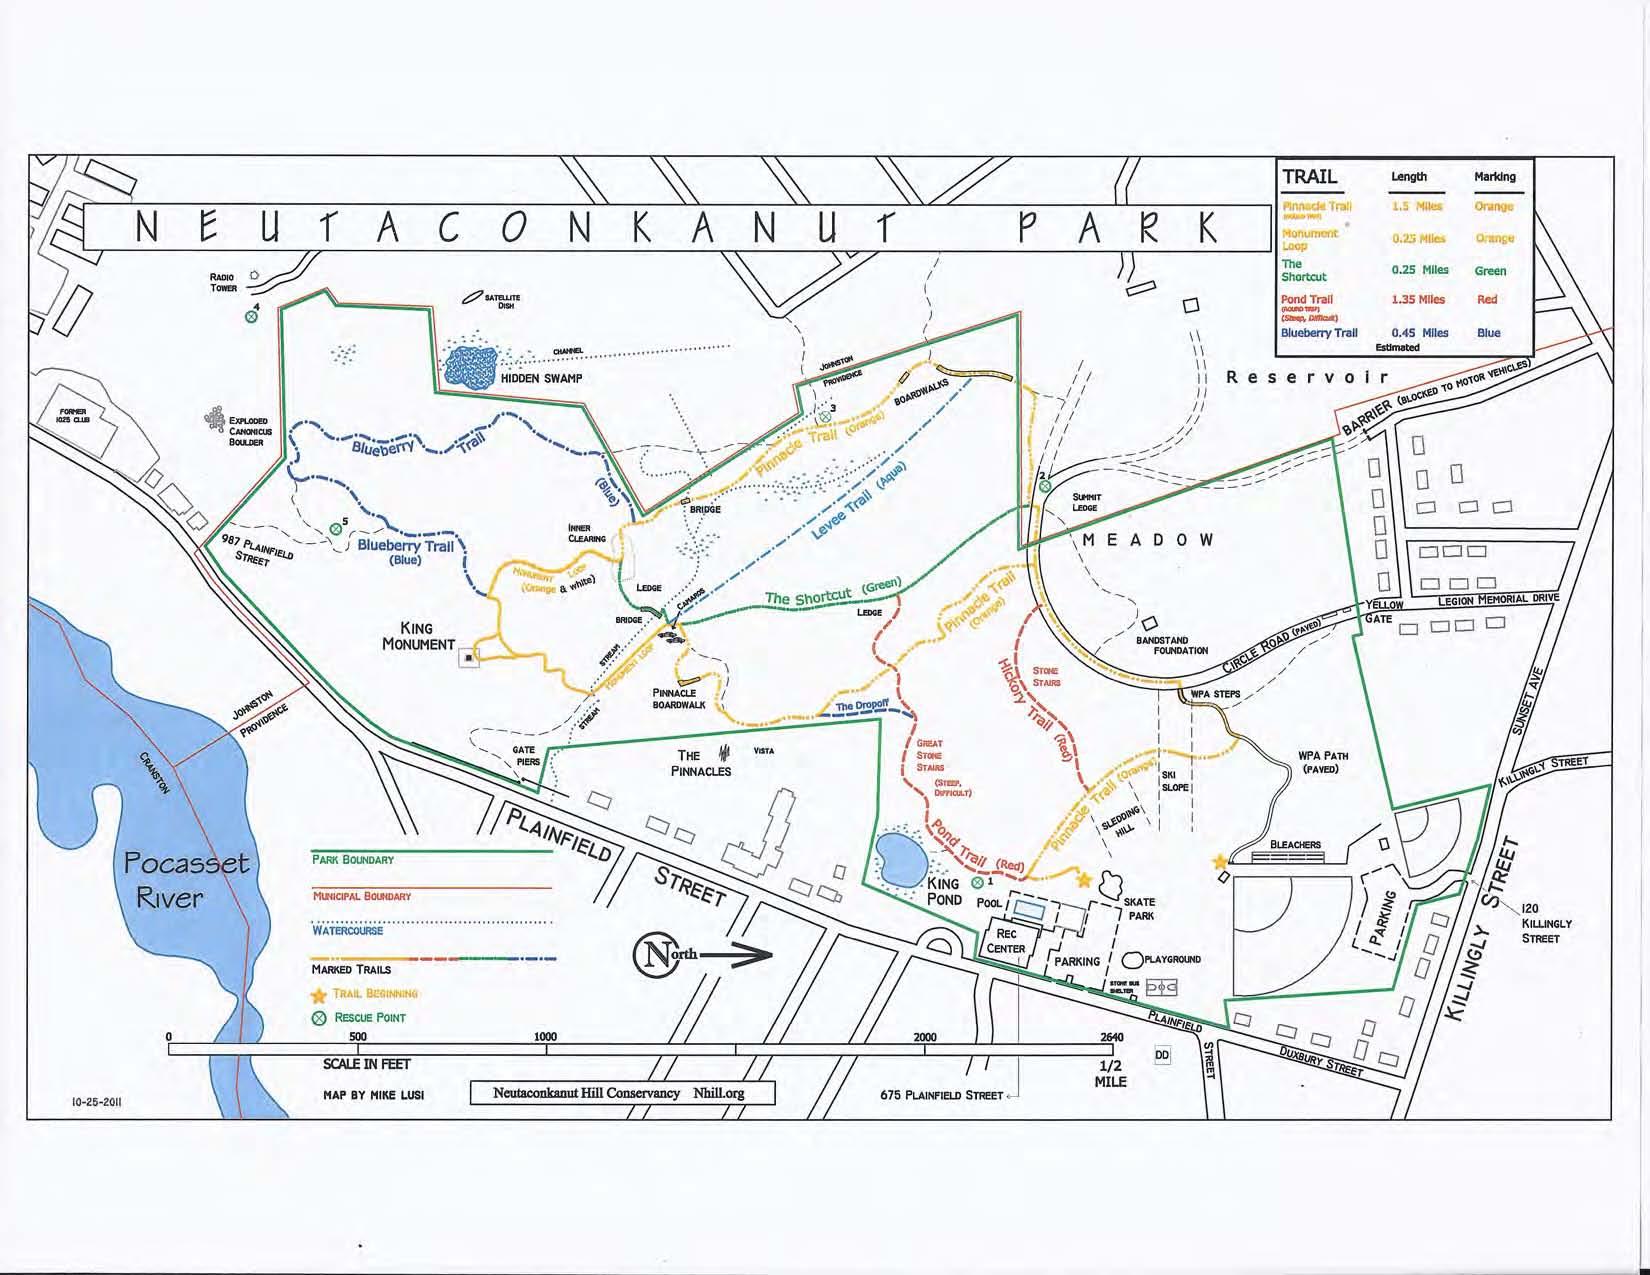 Prudence Island Trail Map